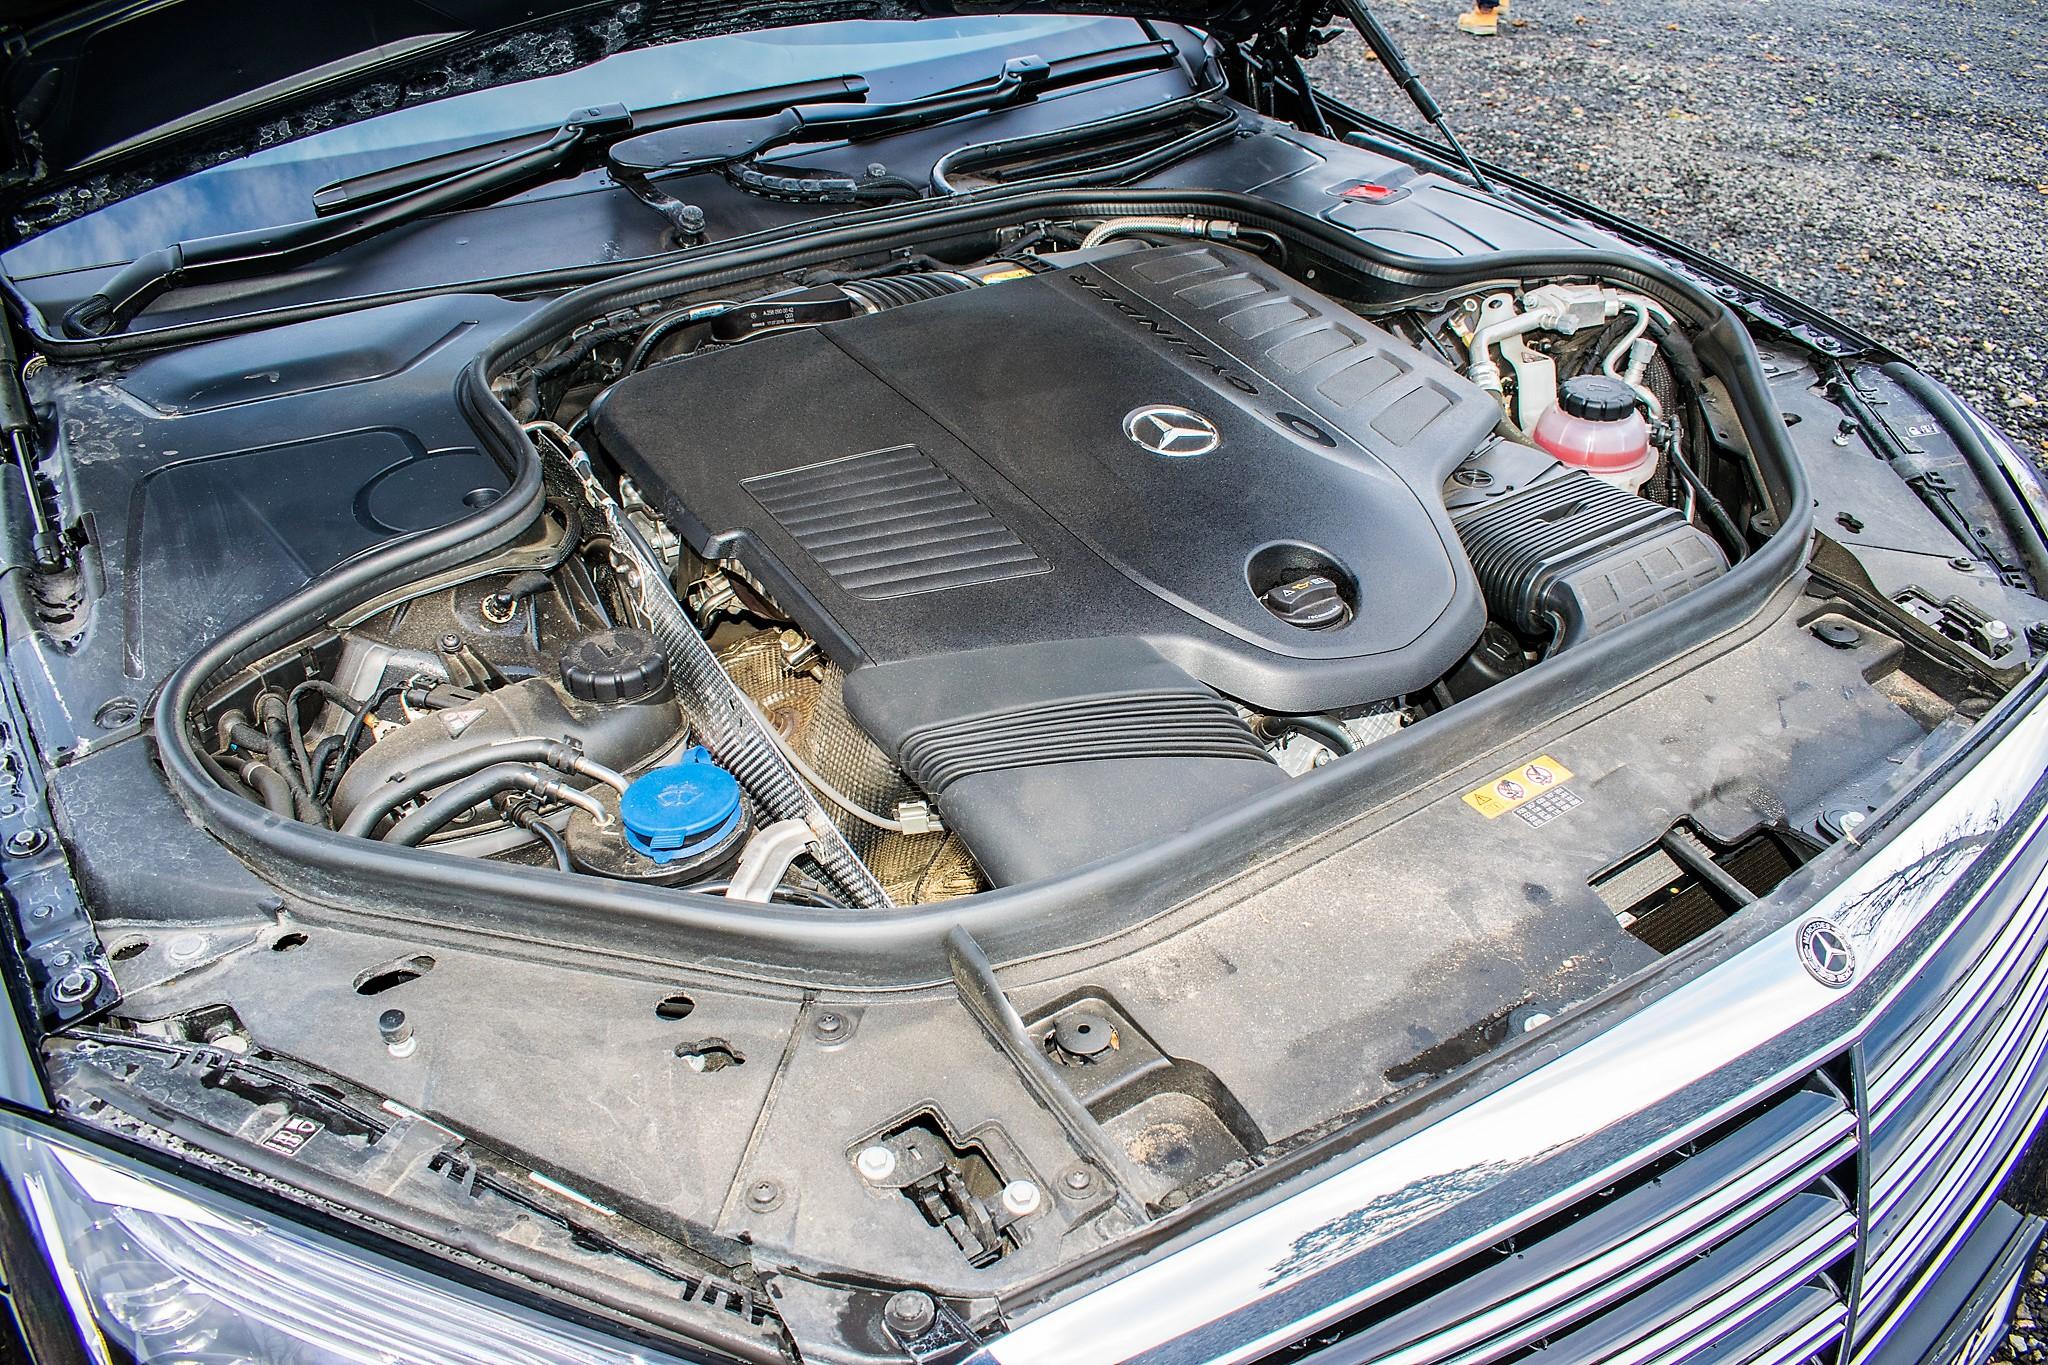 Mercedes Benz S450 L AMG Line Executive auto petrol 4 door saloon car Registration Number: FX68 - Image 33 of 33